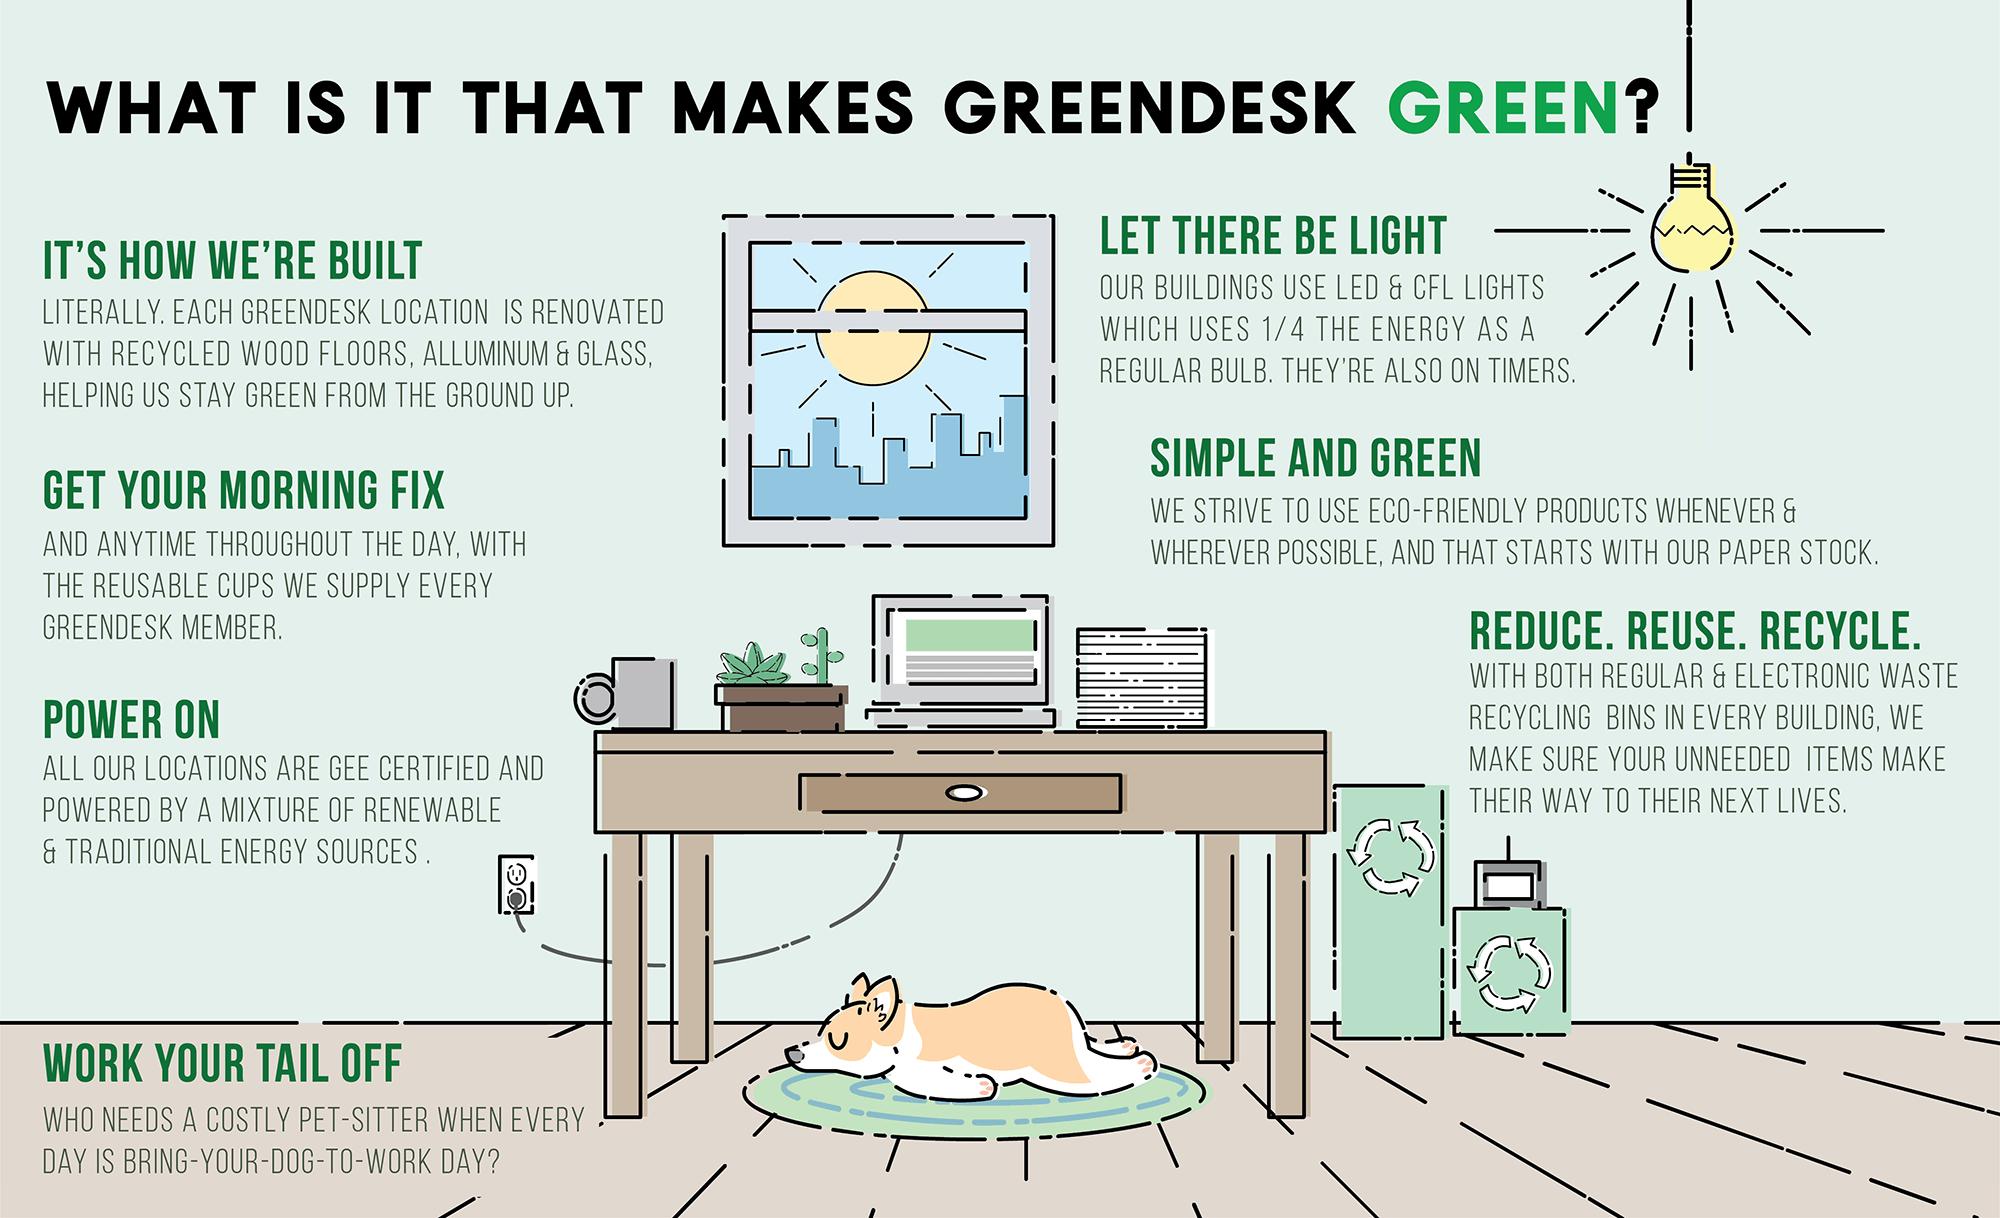 Environmentally Friendly Ad